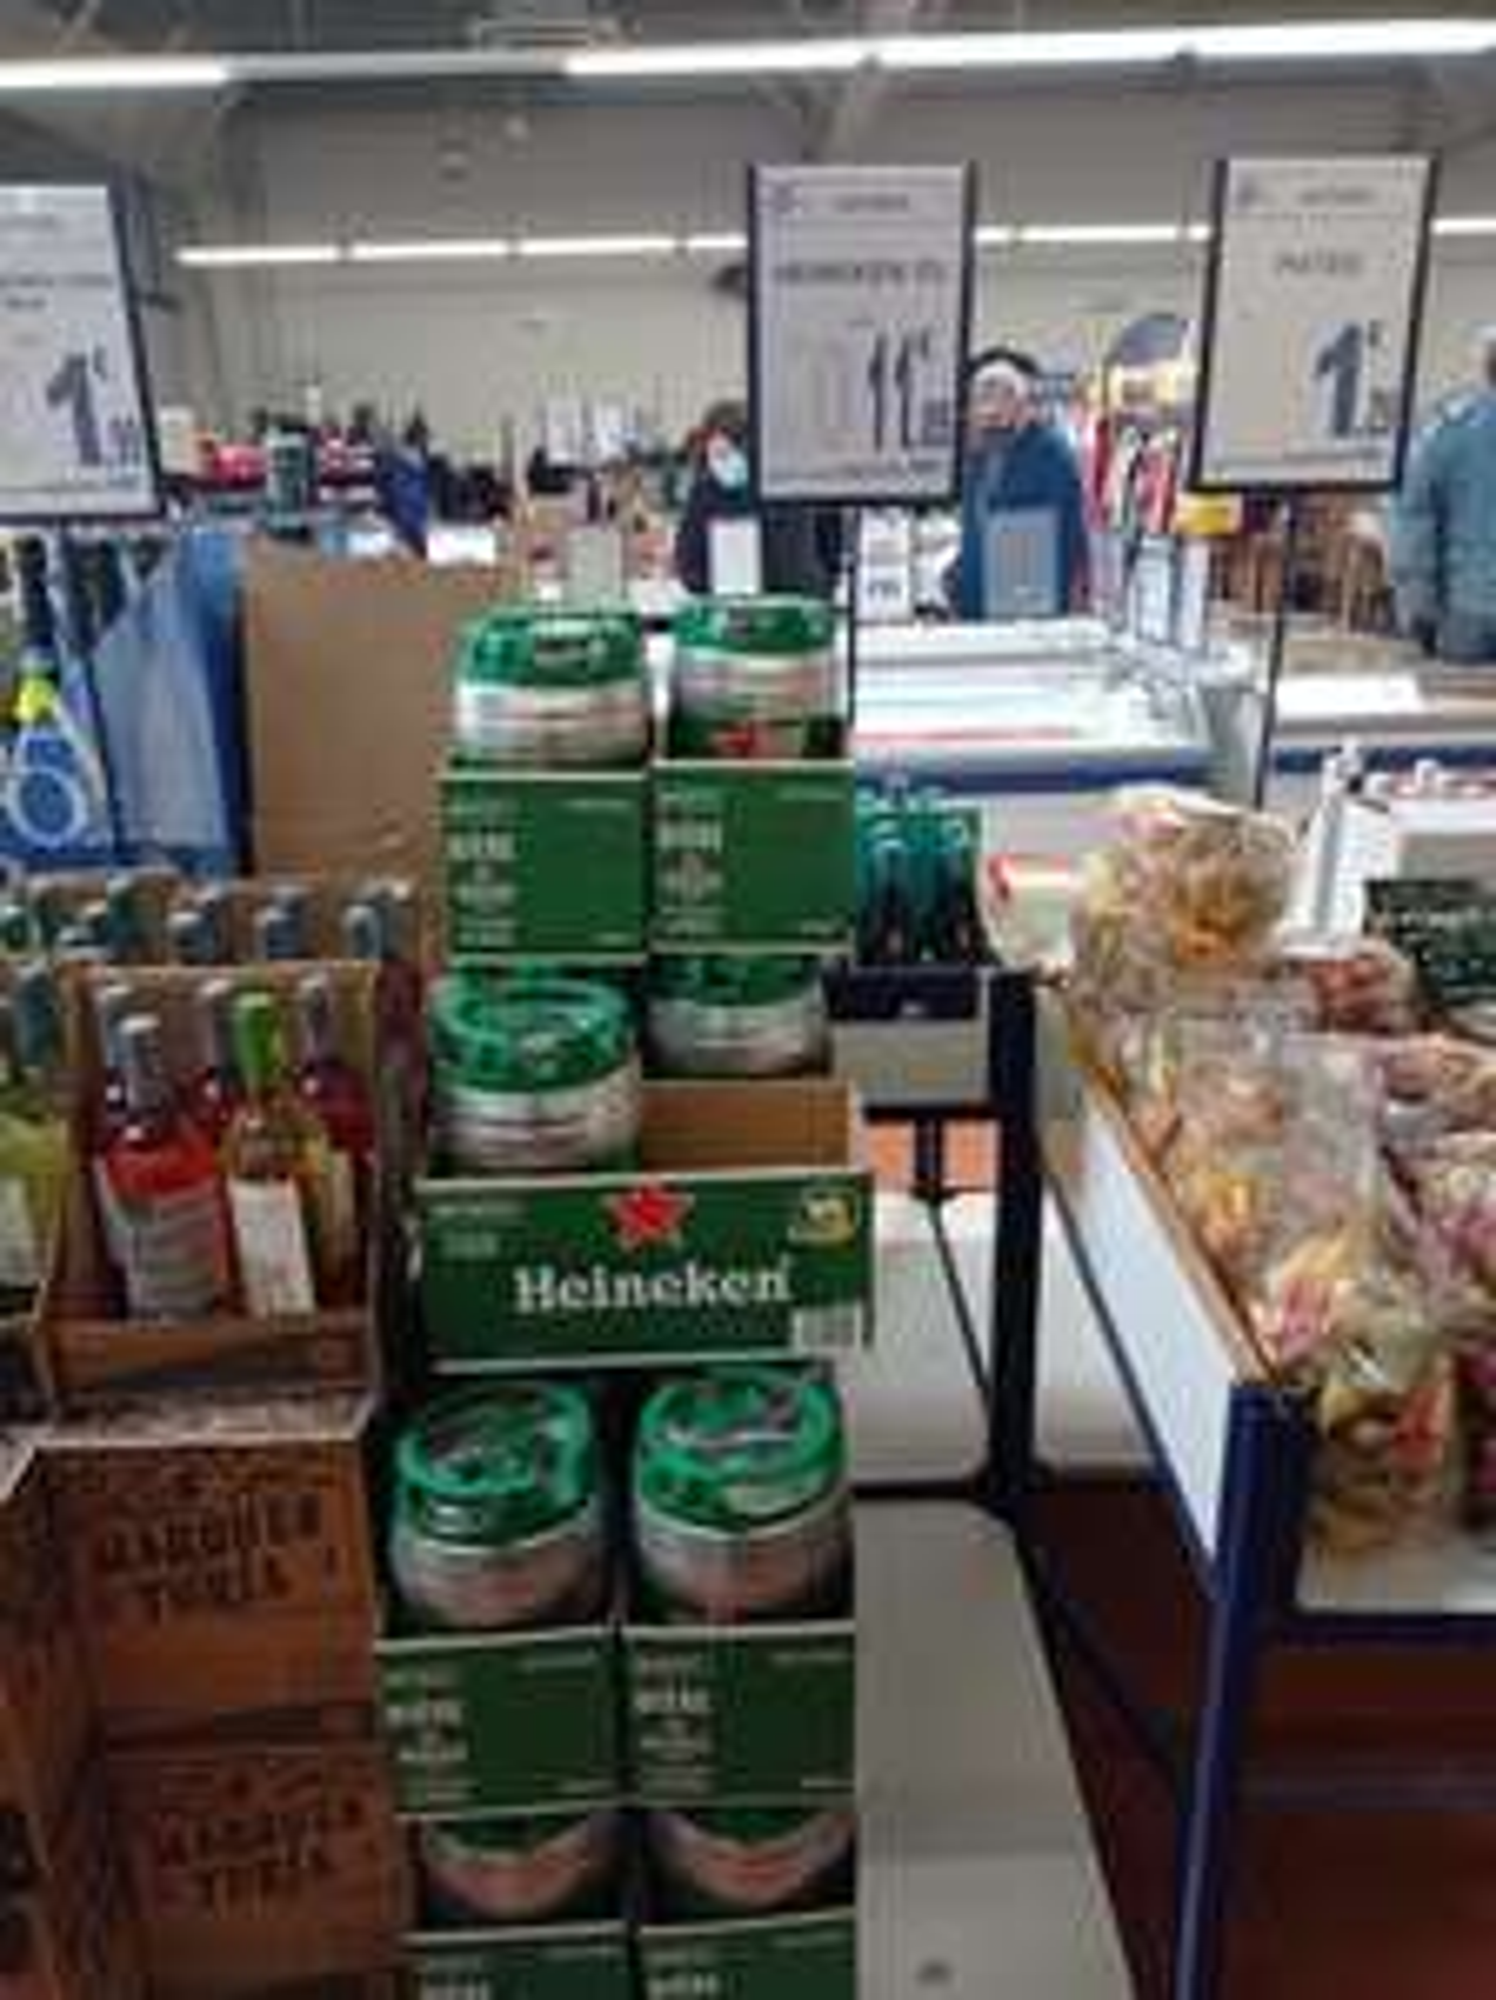 Fut de bière Heineken 5L - Issoudun (36)